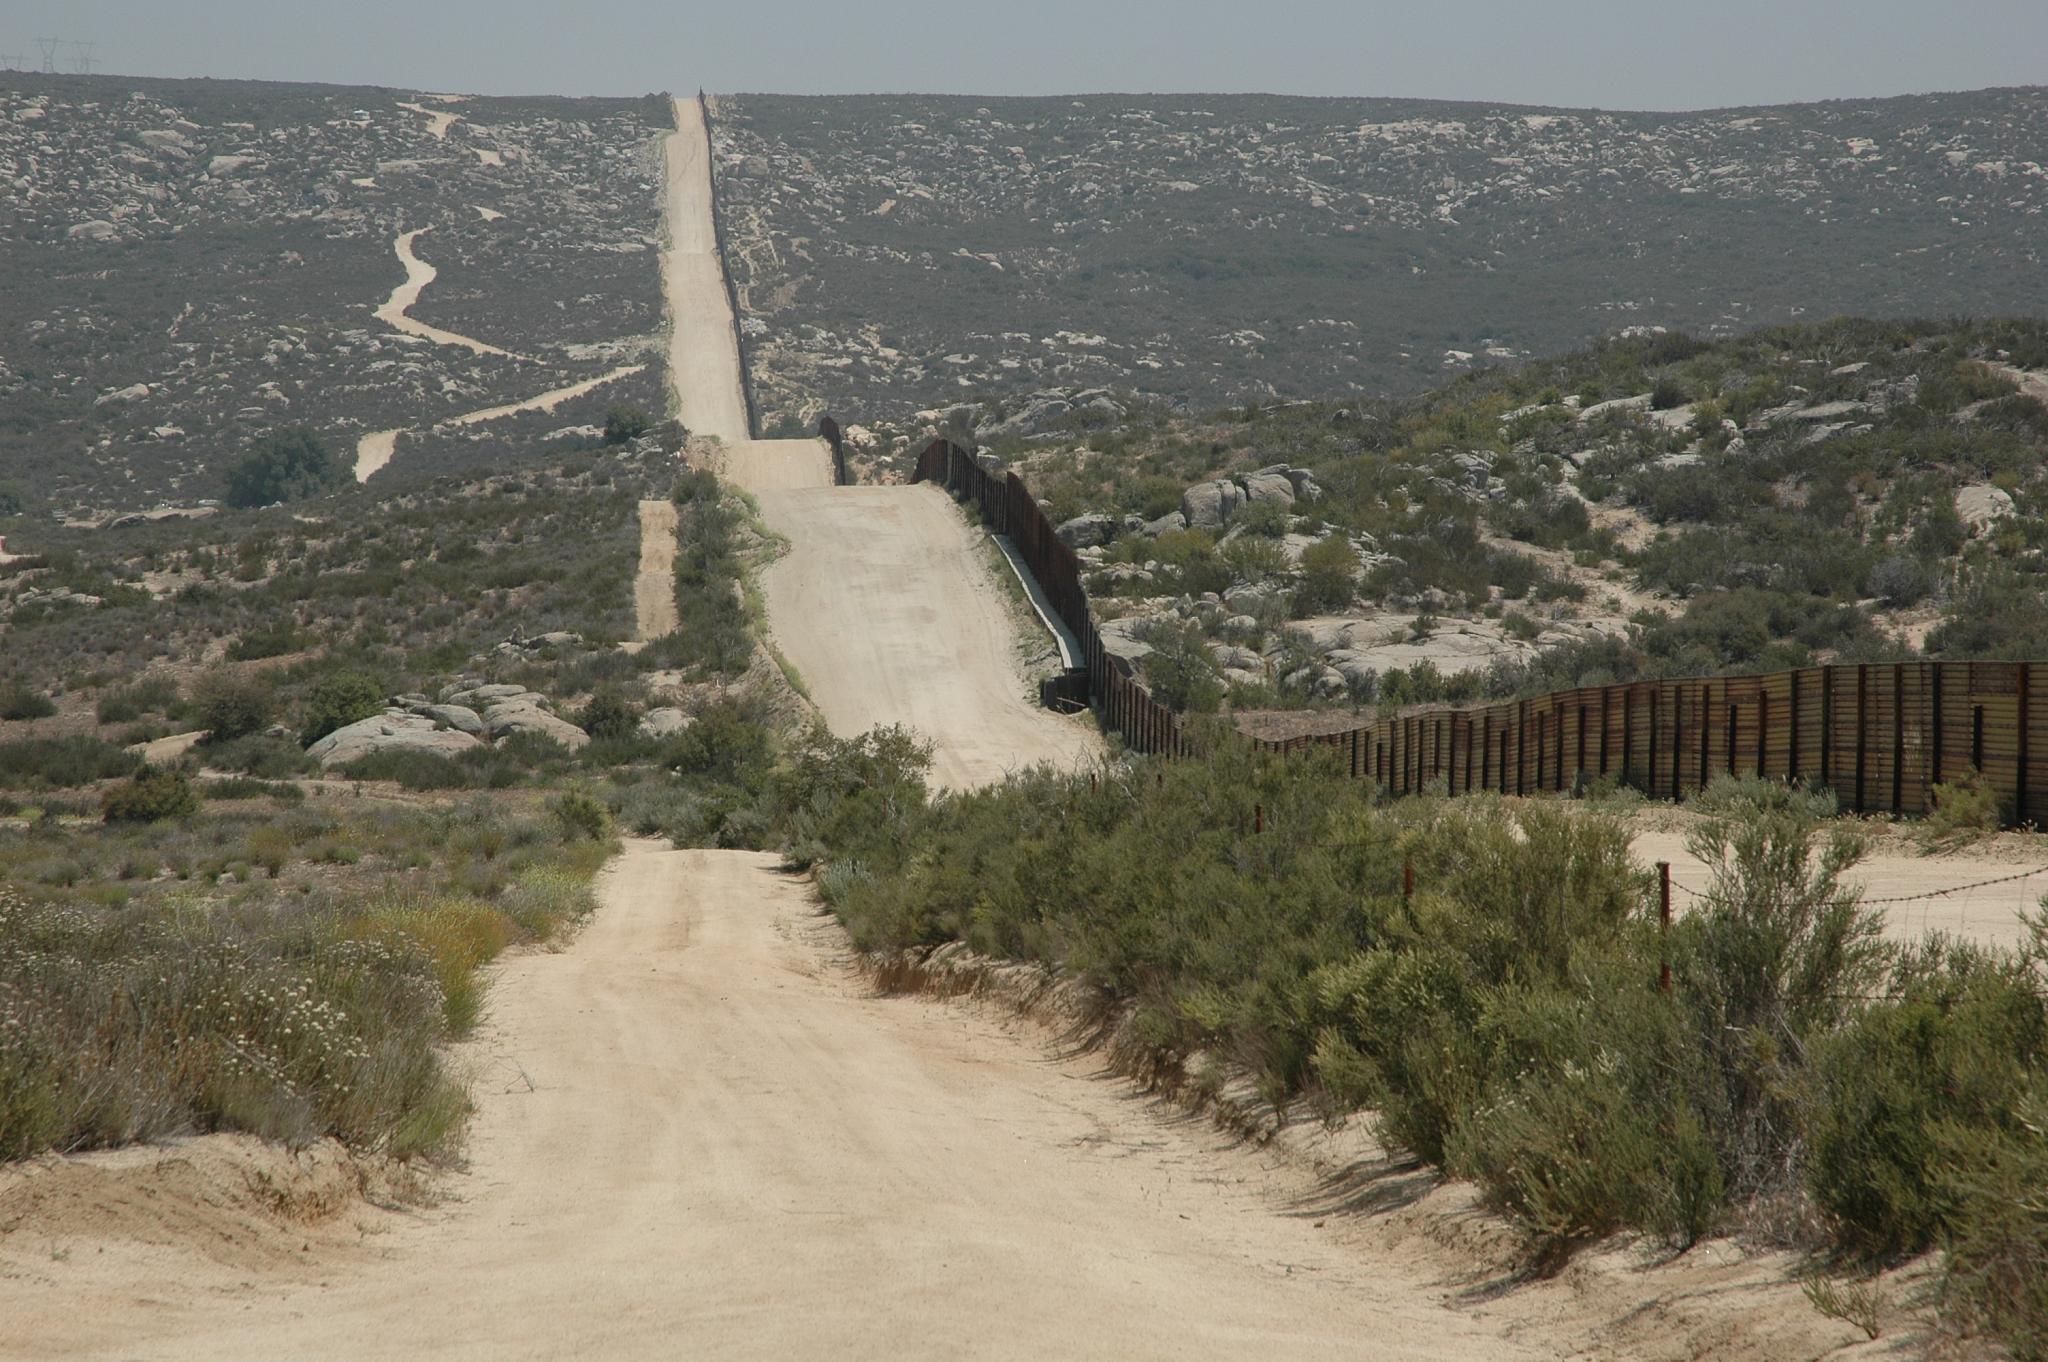 Migrant apprehensions surge on U.S.-Mexico border